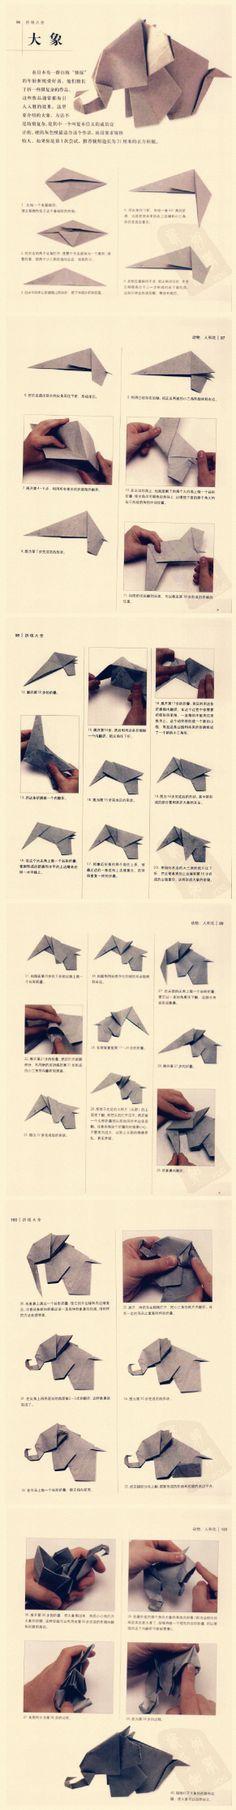 origami elephant-love this elephant, wish instructions were translated into English.